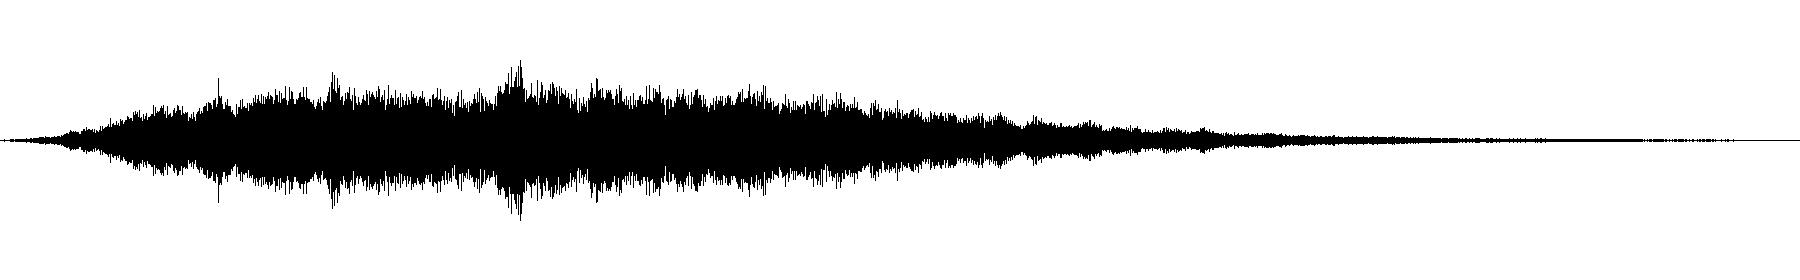 synth choir bm